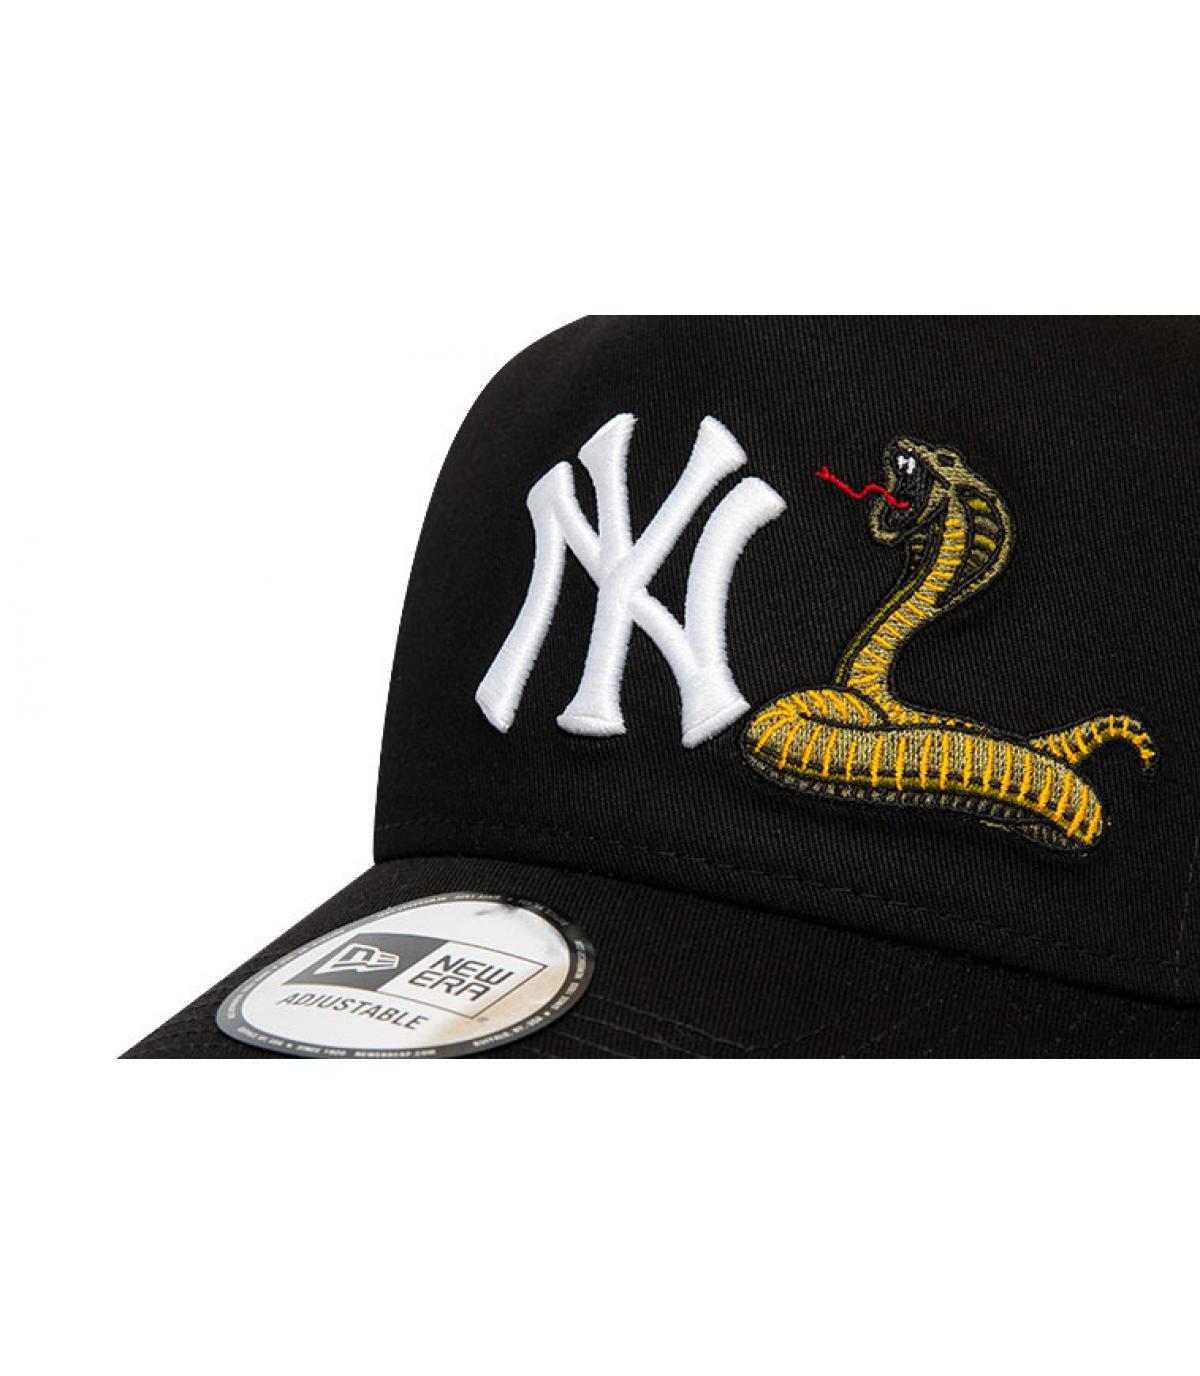 Details Trucker MLB Twine NY black - afbeeling 3